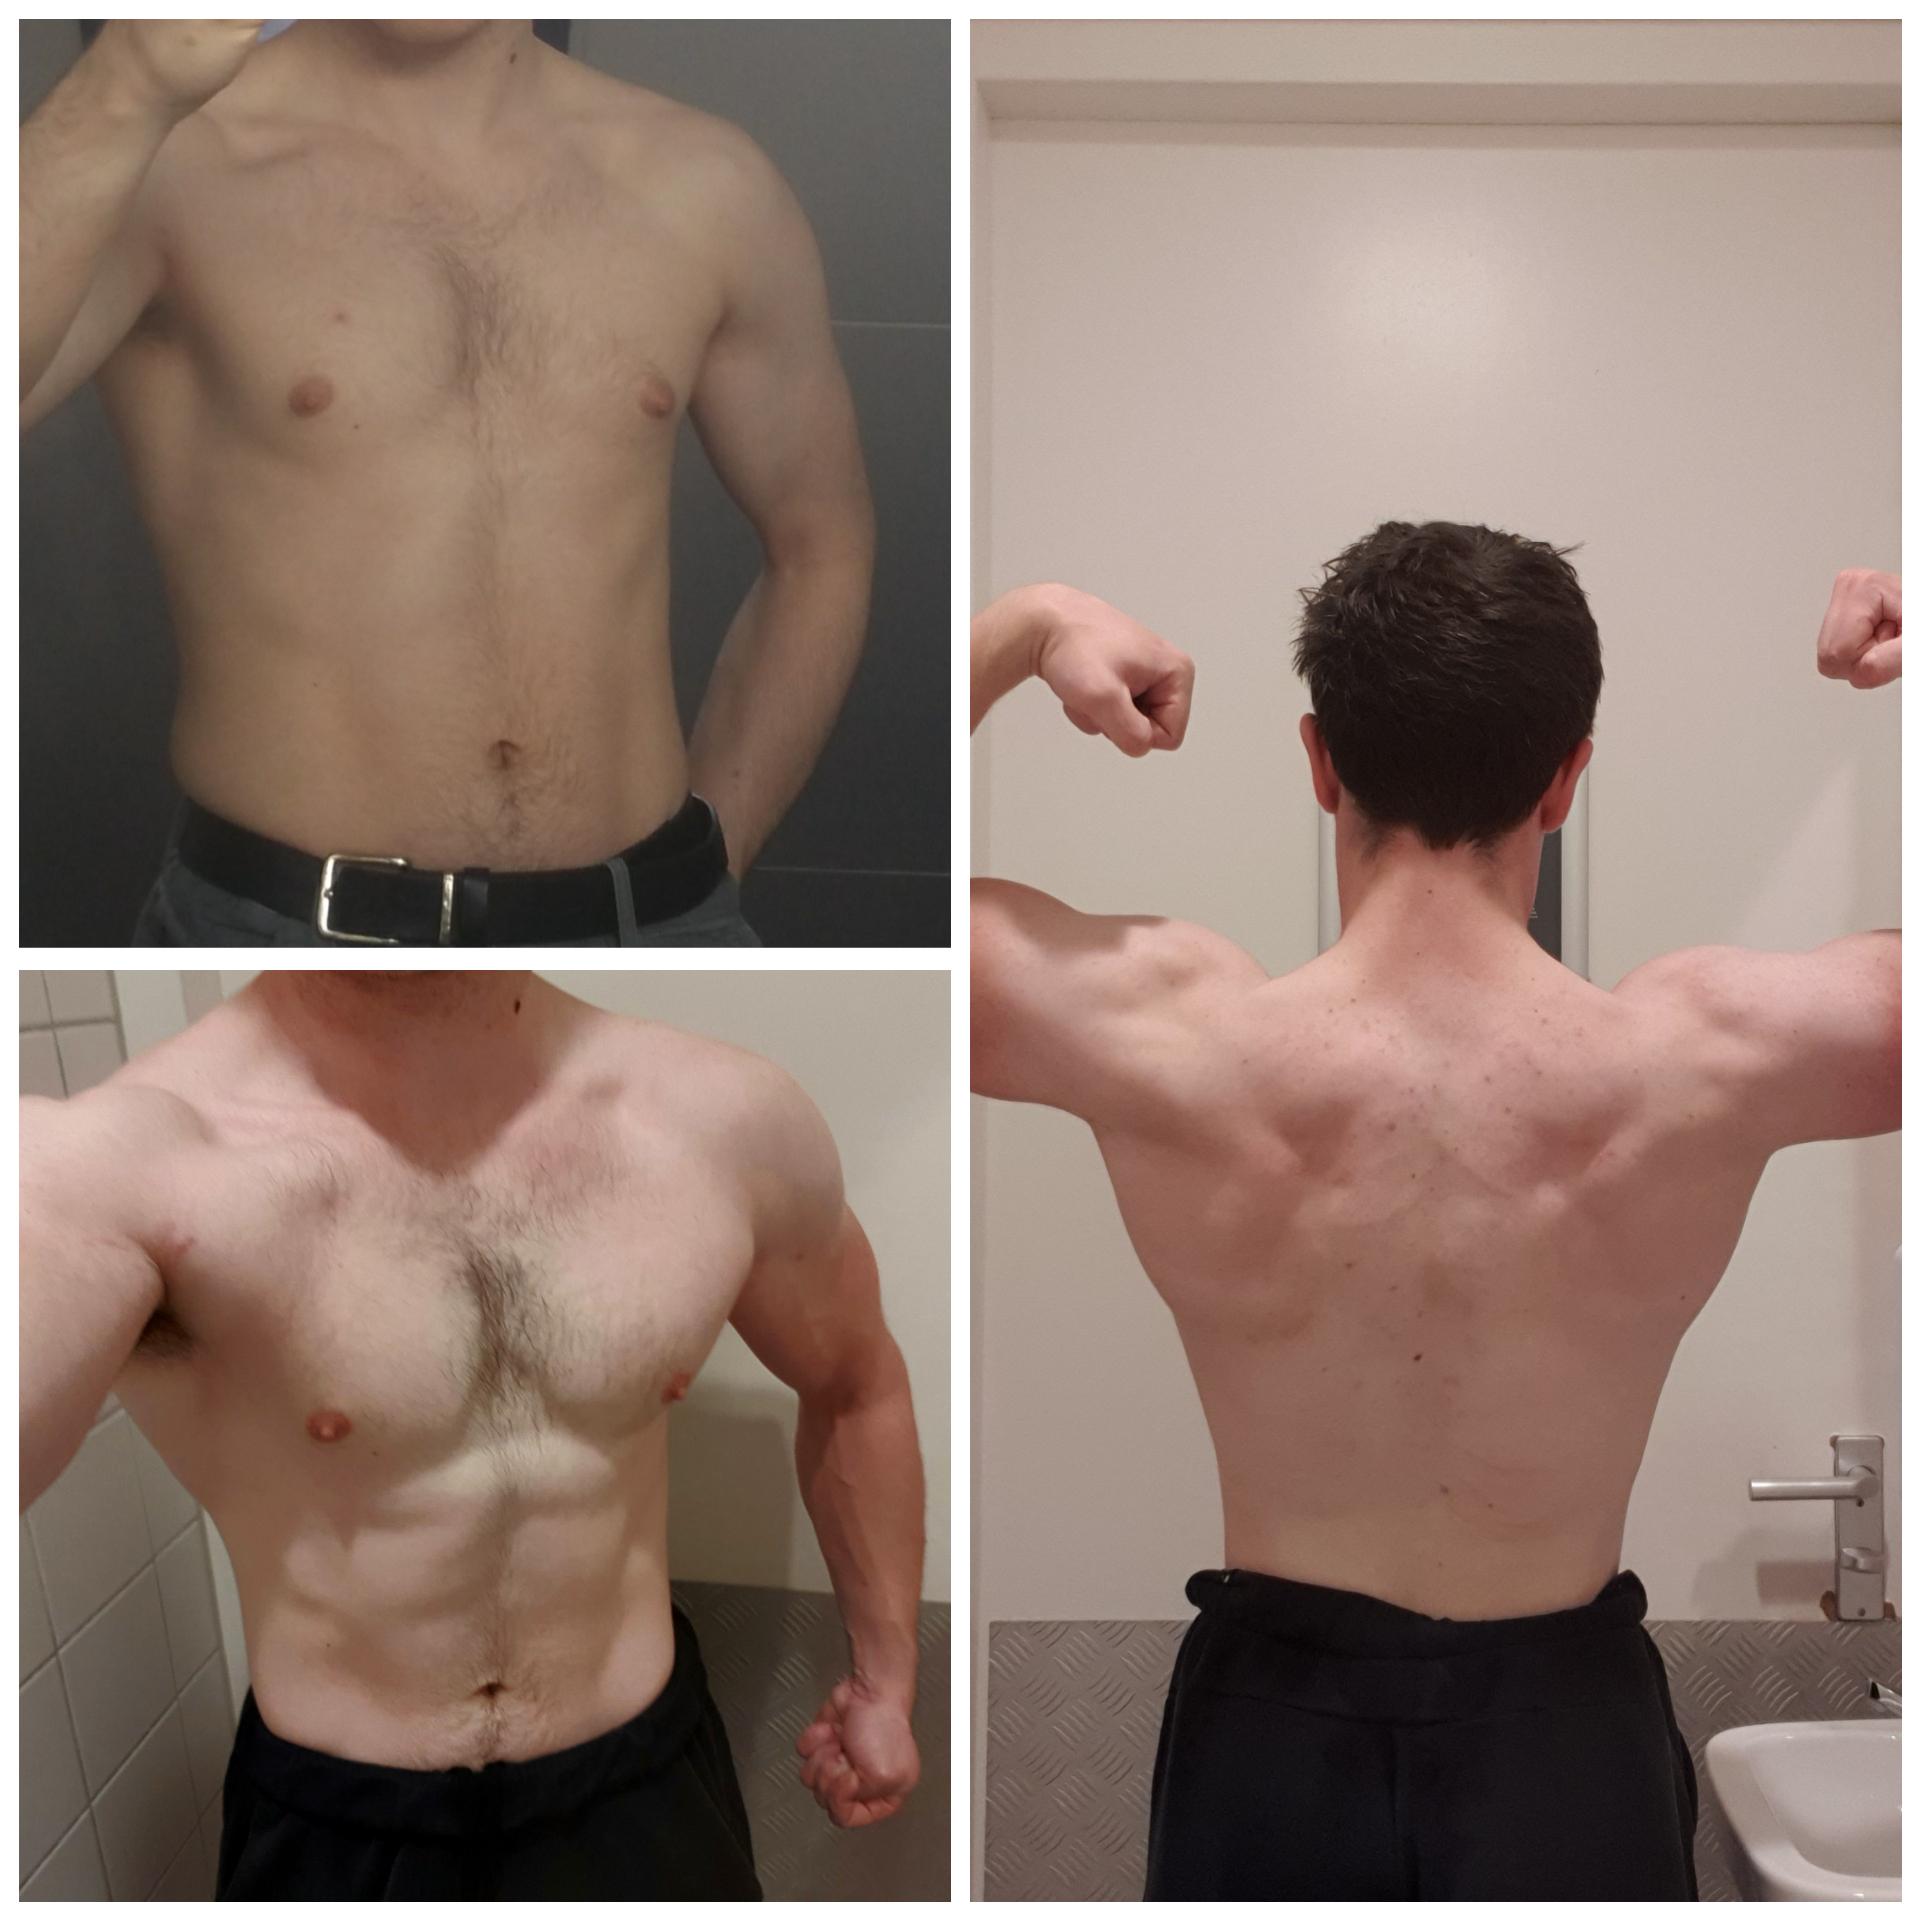 5'11 Male 30 lbs Muscle Gain 146 lbs to 176 lbs